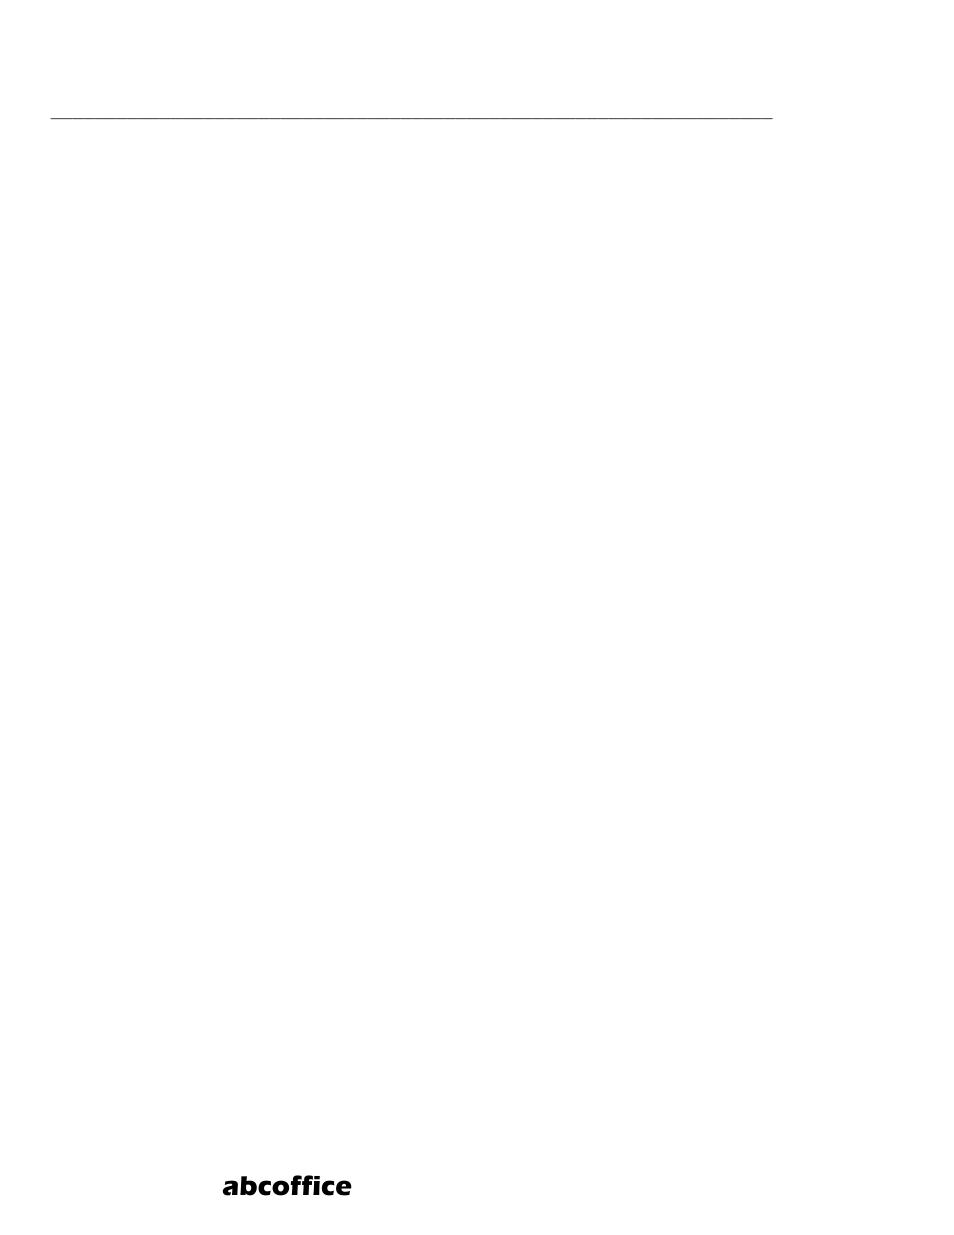 Abcoffice, Key pad functions | ABC Office ROYAL 110CX User Manual | Page  117 /